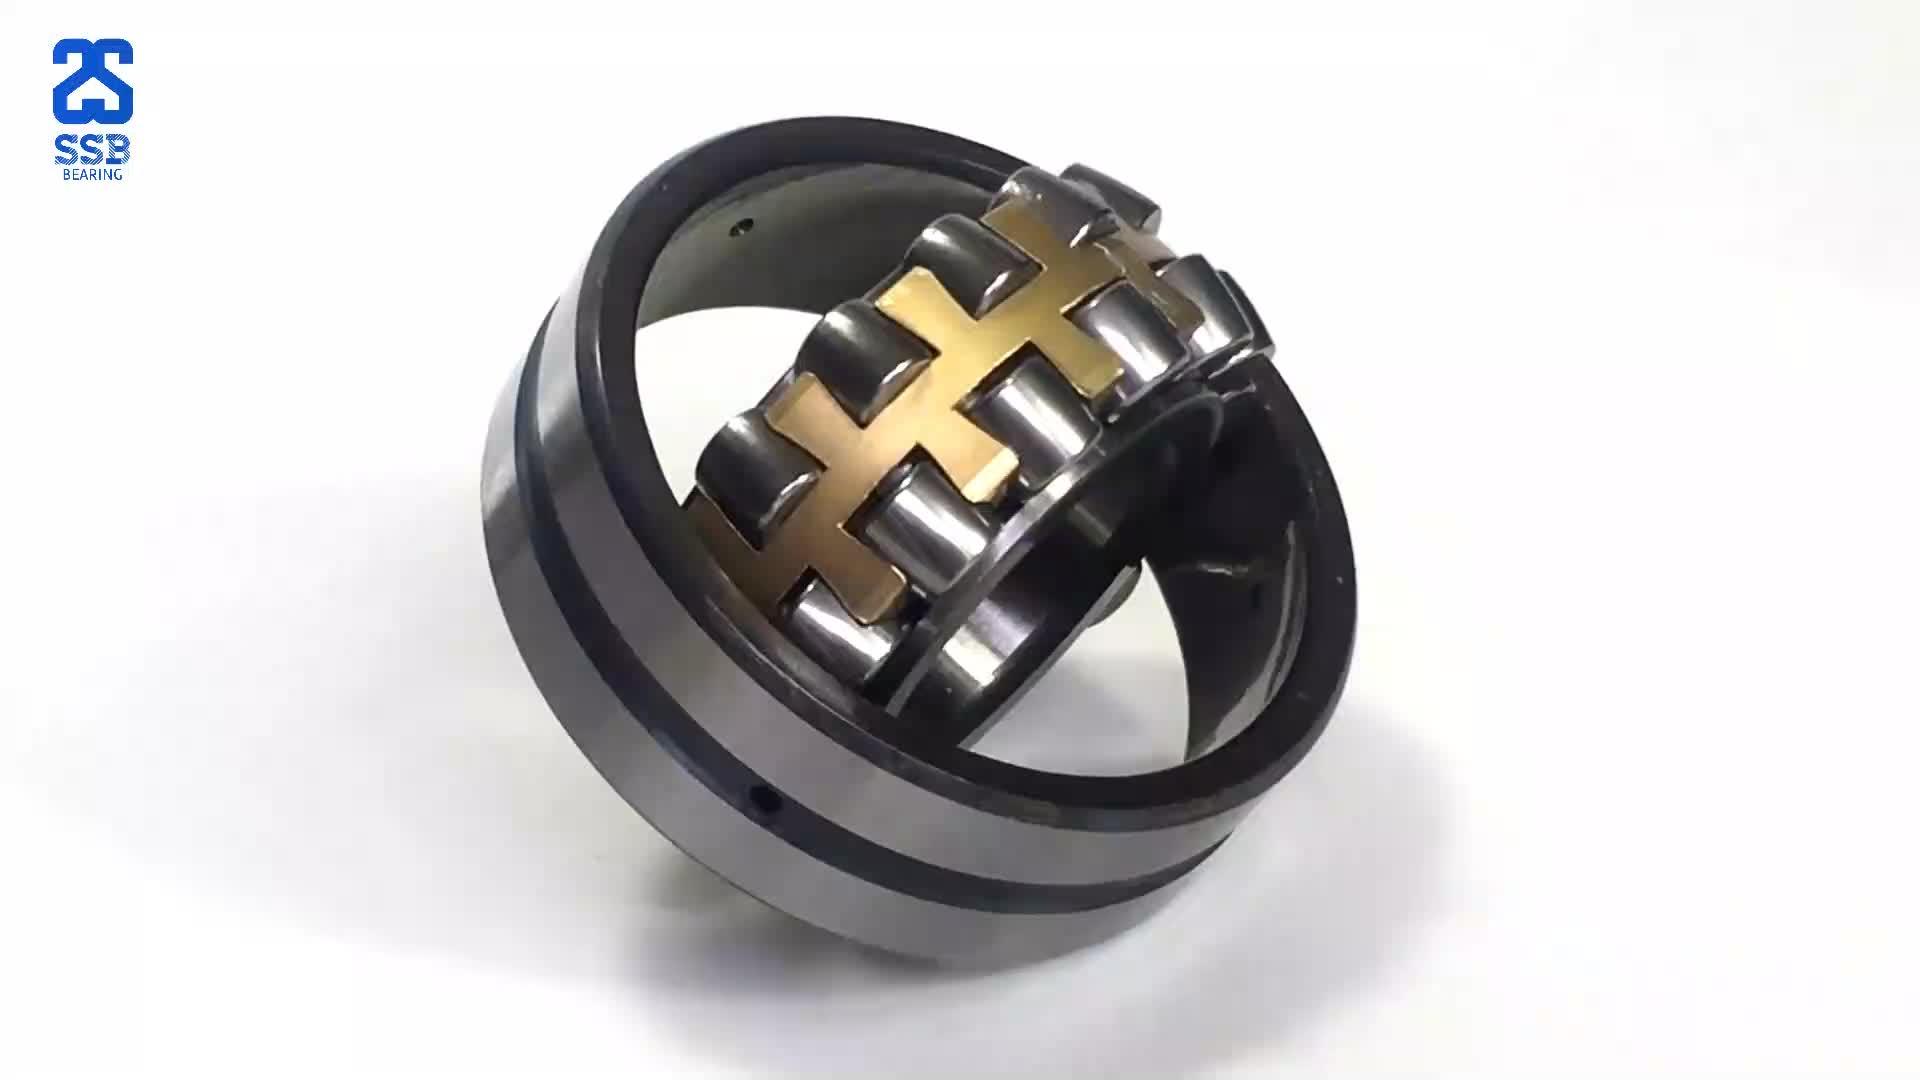 Japan High Precision bearing 2204 2205 2206 2207 2208 2209 2210 Self-aligning ball bearing